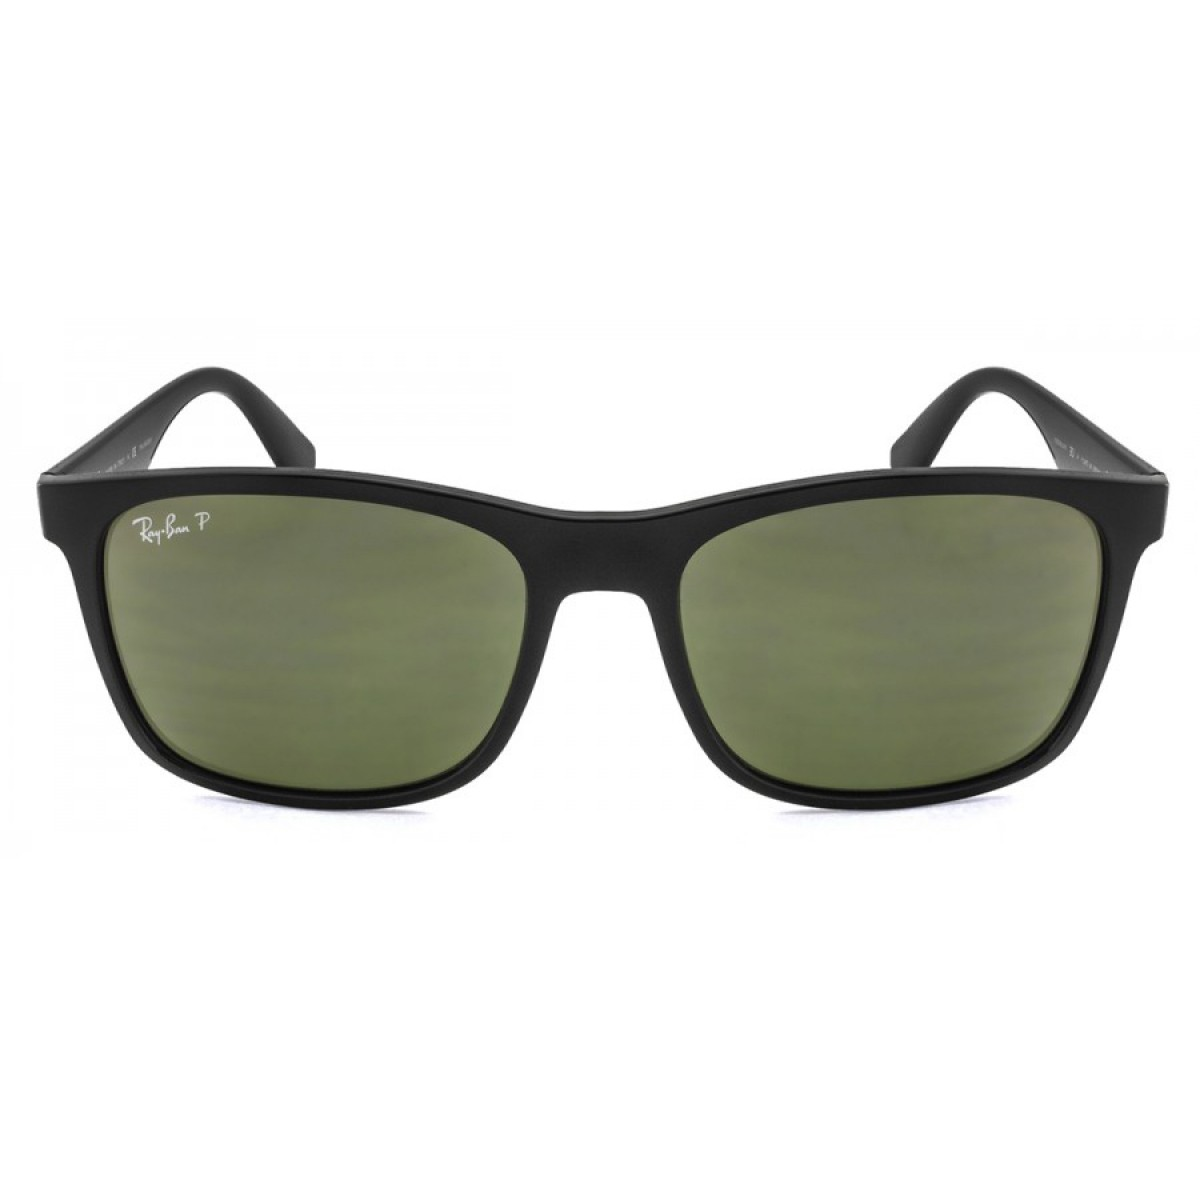 330dc689122b Ray Ban Square Acetate Polarized Men Sunglasses RB4232-601/9A ...